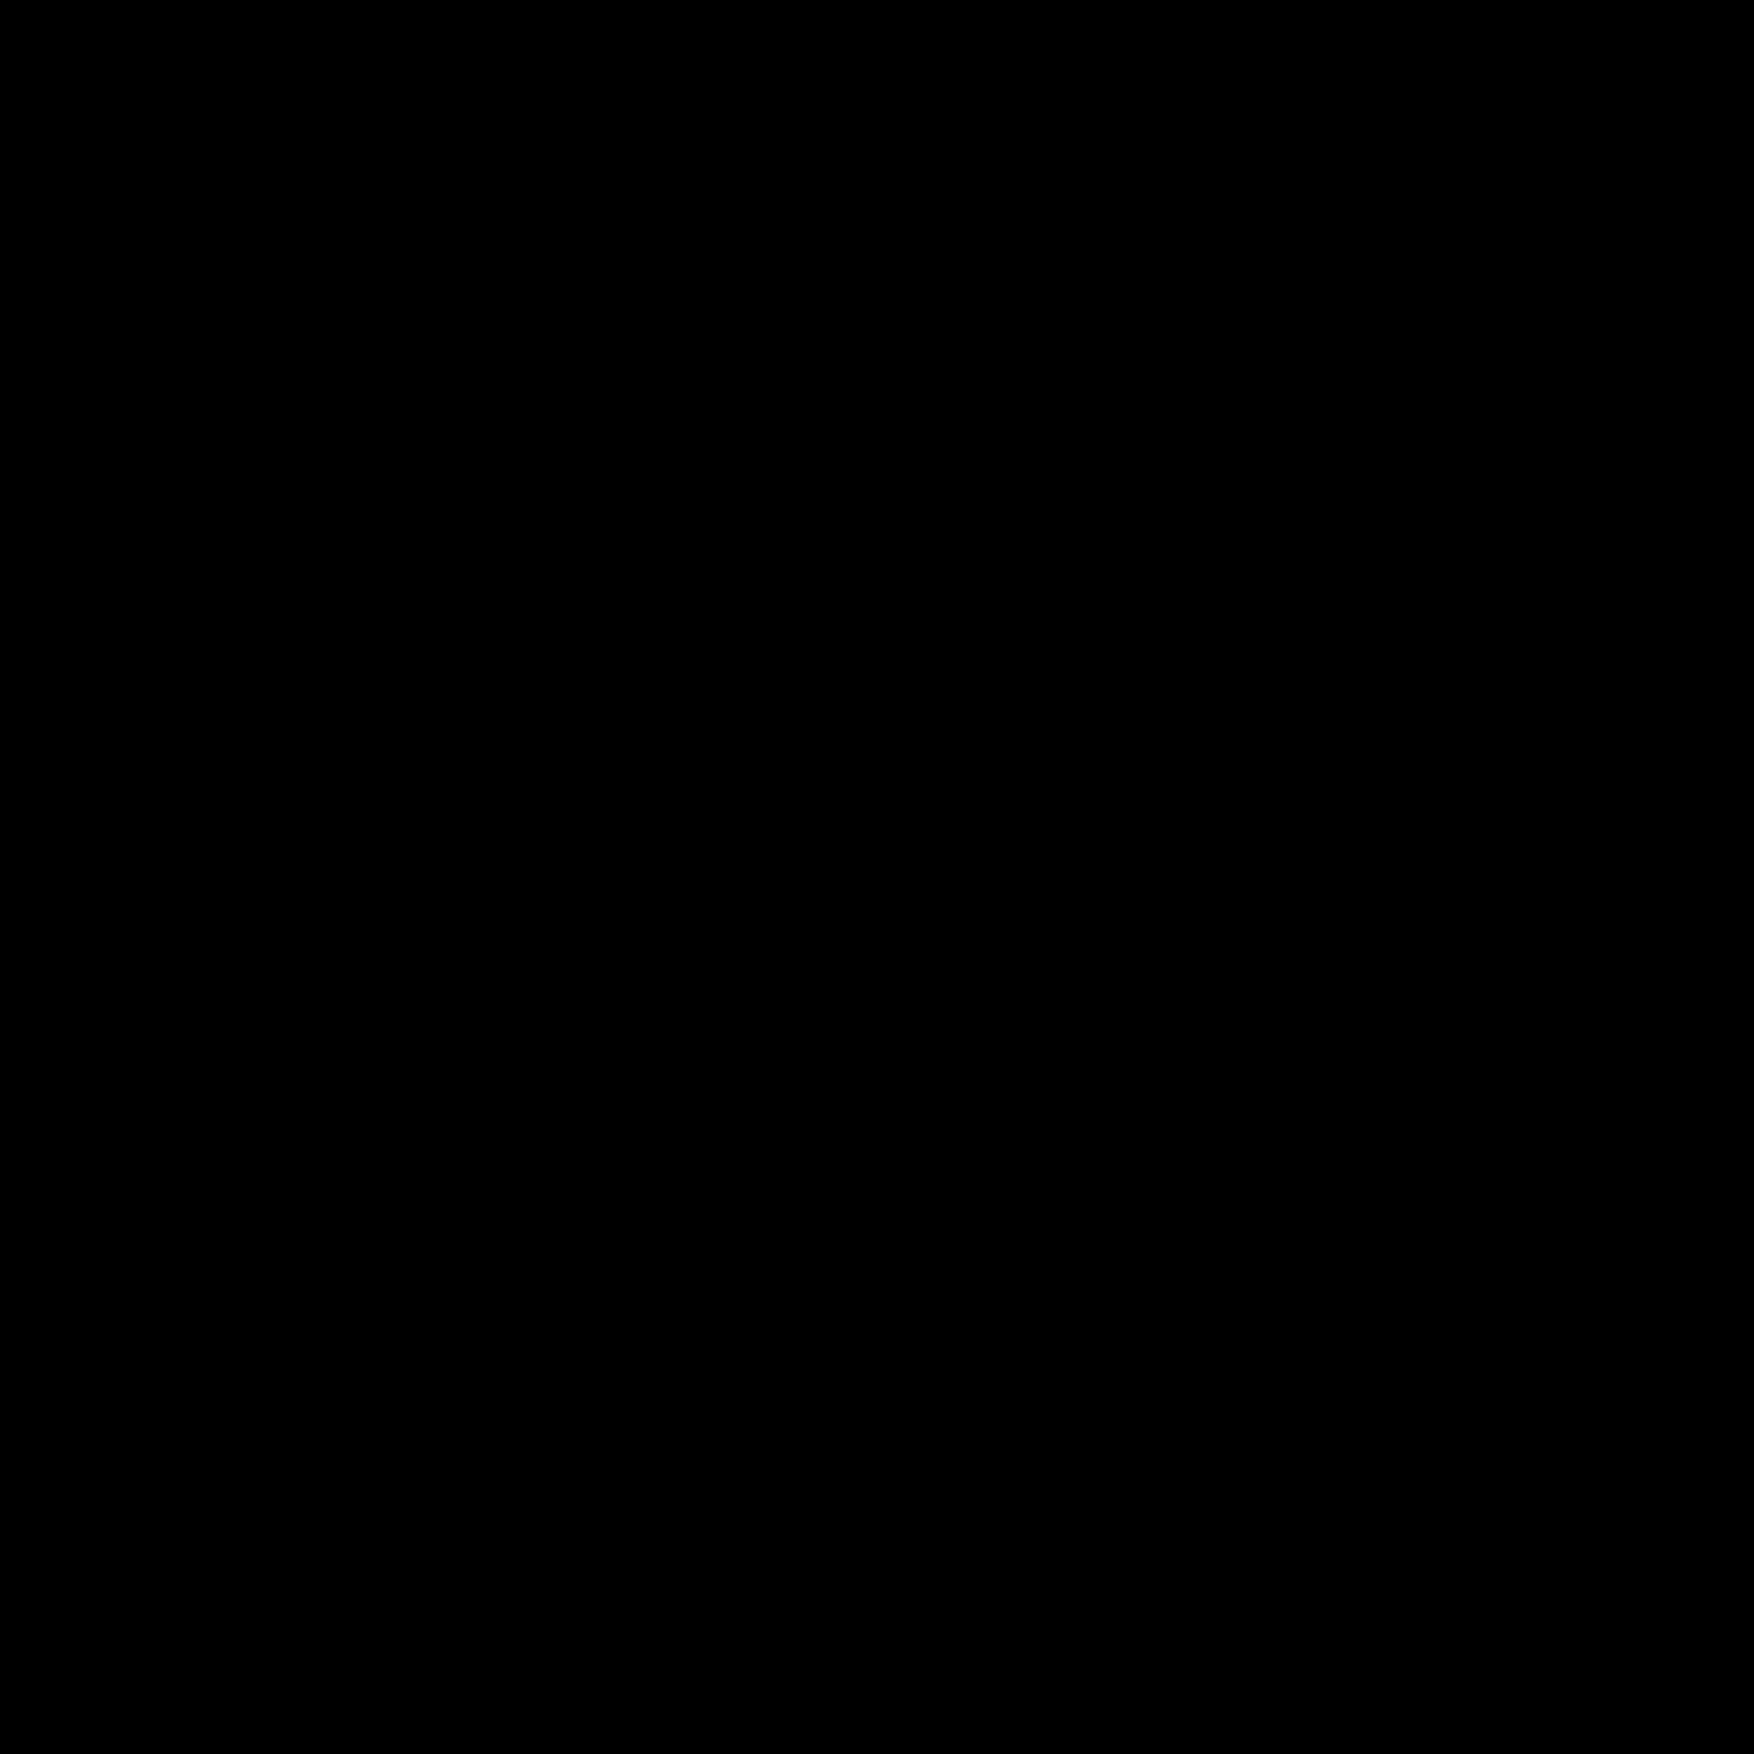 Círculo oscuro